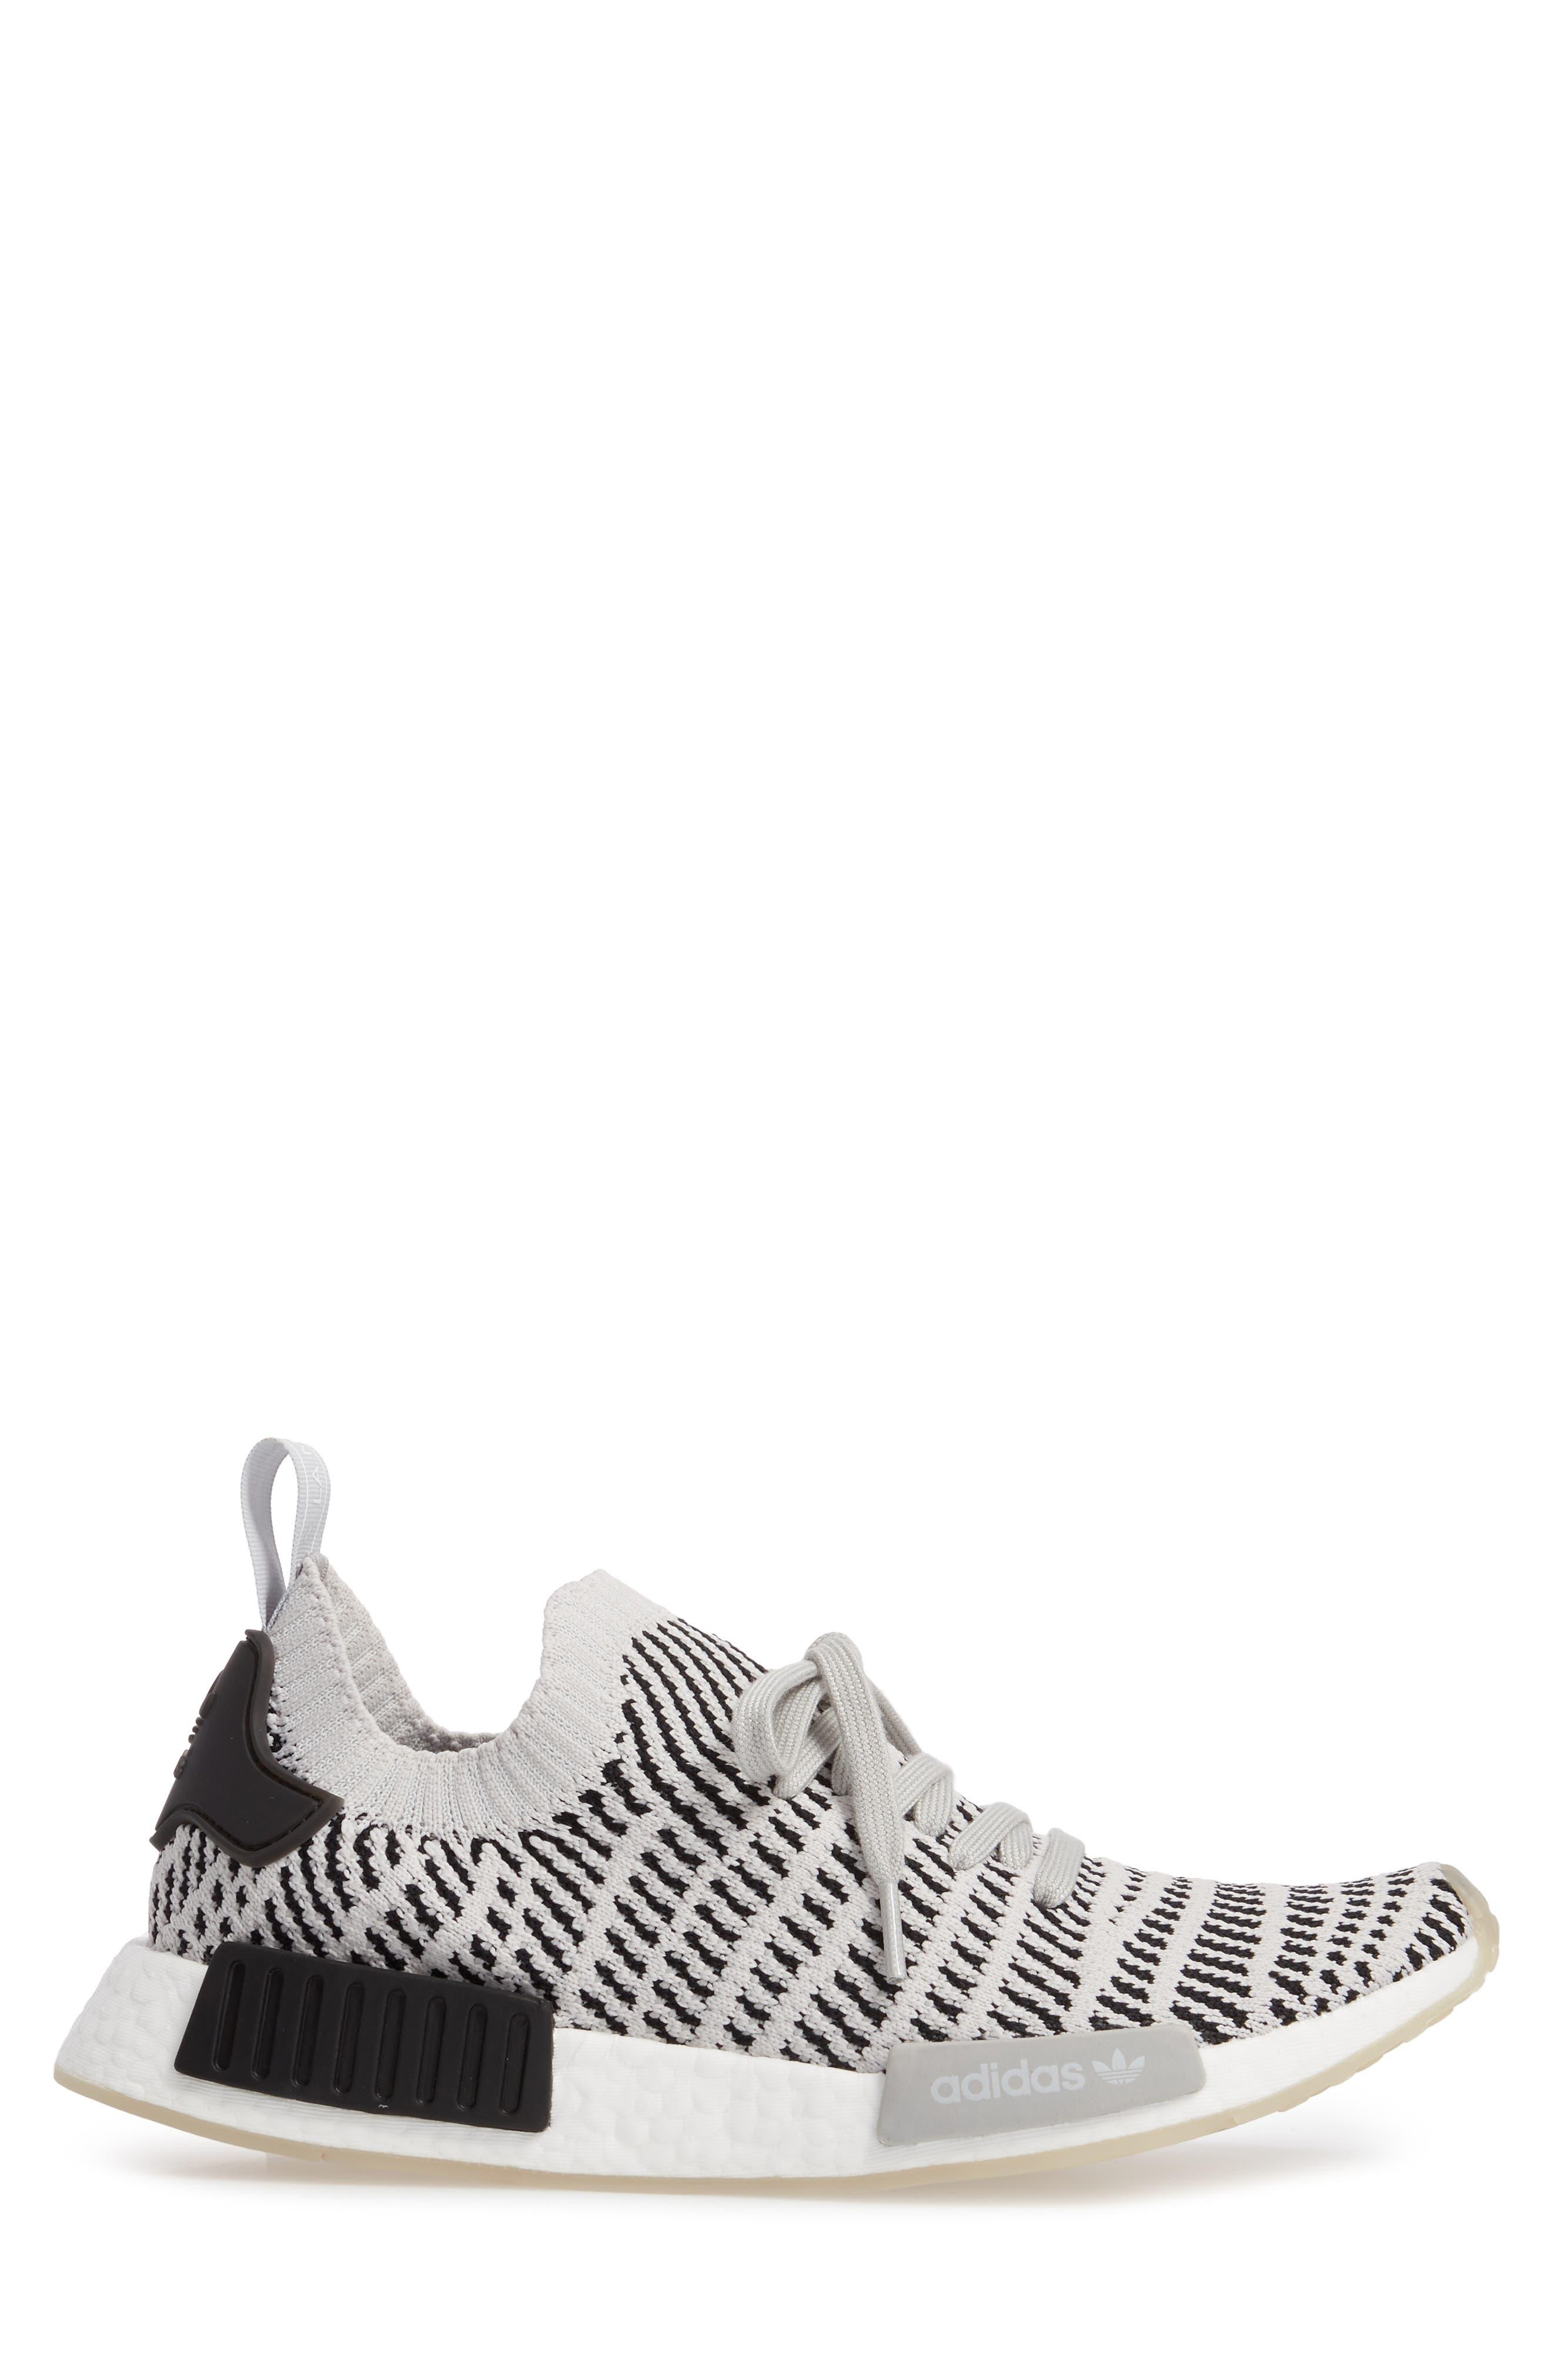 NMD R1 STLT Primeknit Sneaker,                             Alternate thumbnail 3, color,                             033